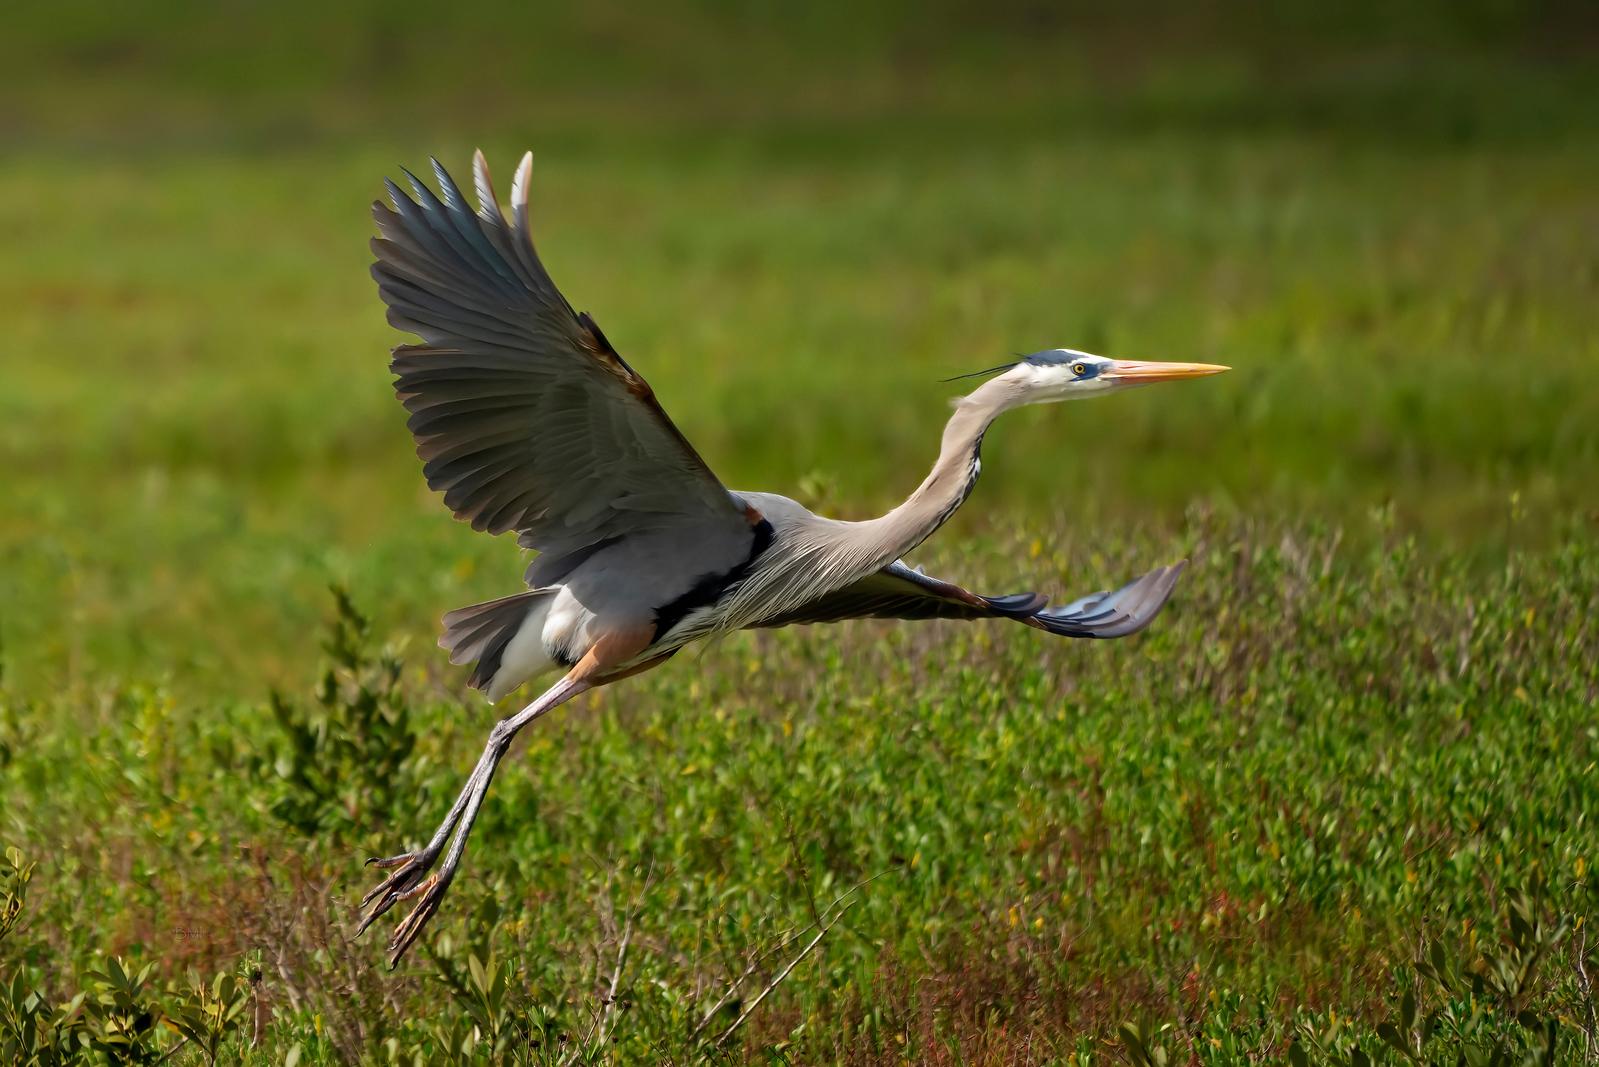 IMAGE: https://photos.smugmug.com/Beautyinthetreesandintheair/Photo-Archives-of-Birds/Bird-photo-archives/i-DQJQ8GL/0/1bd4fd17/X3/Great%20blue%20heron%202-18-19-5-X3.jpg